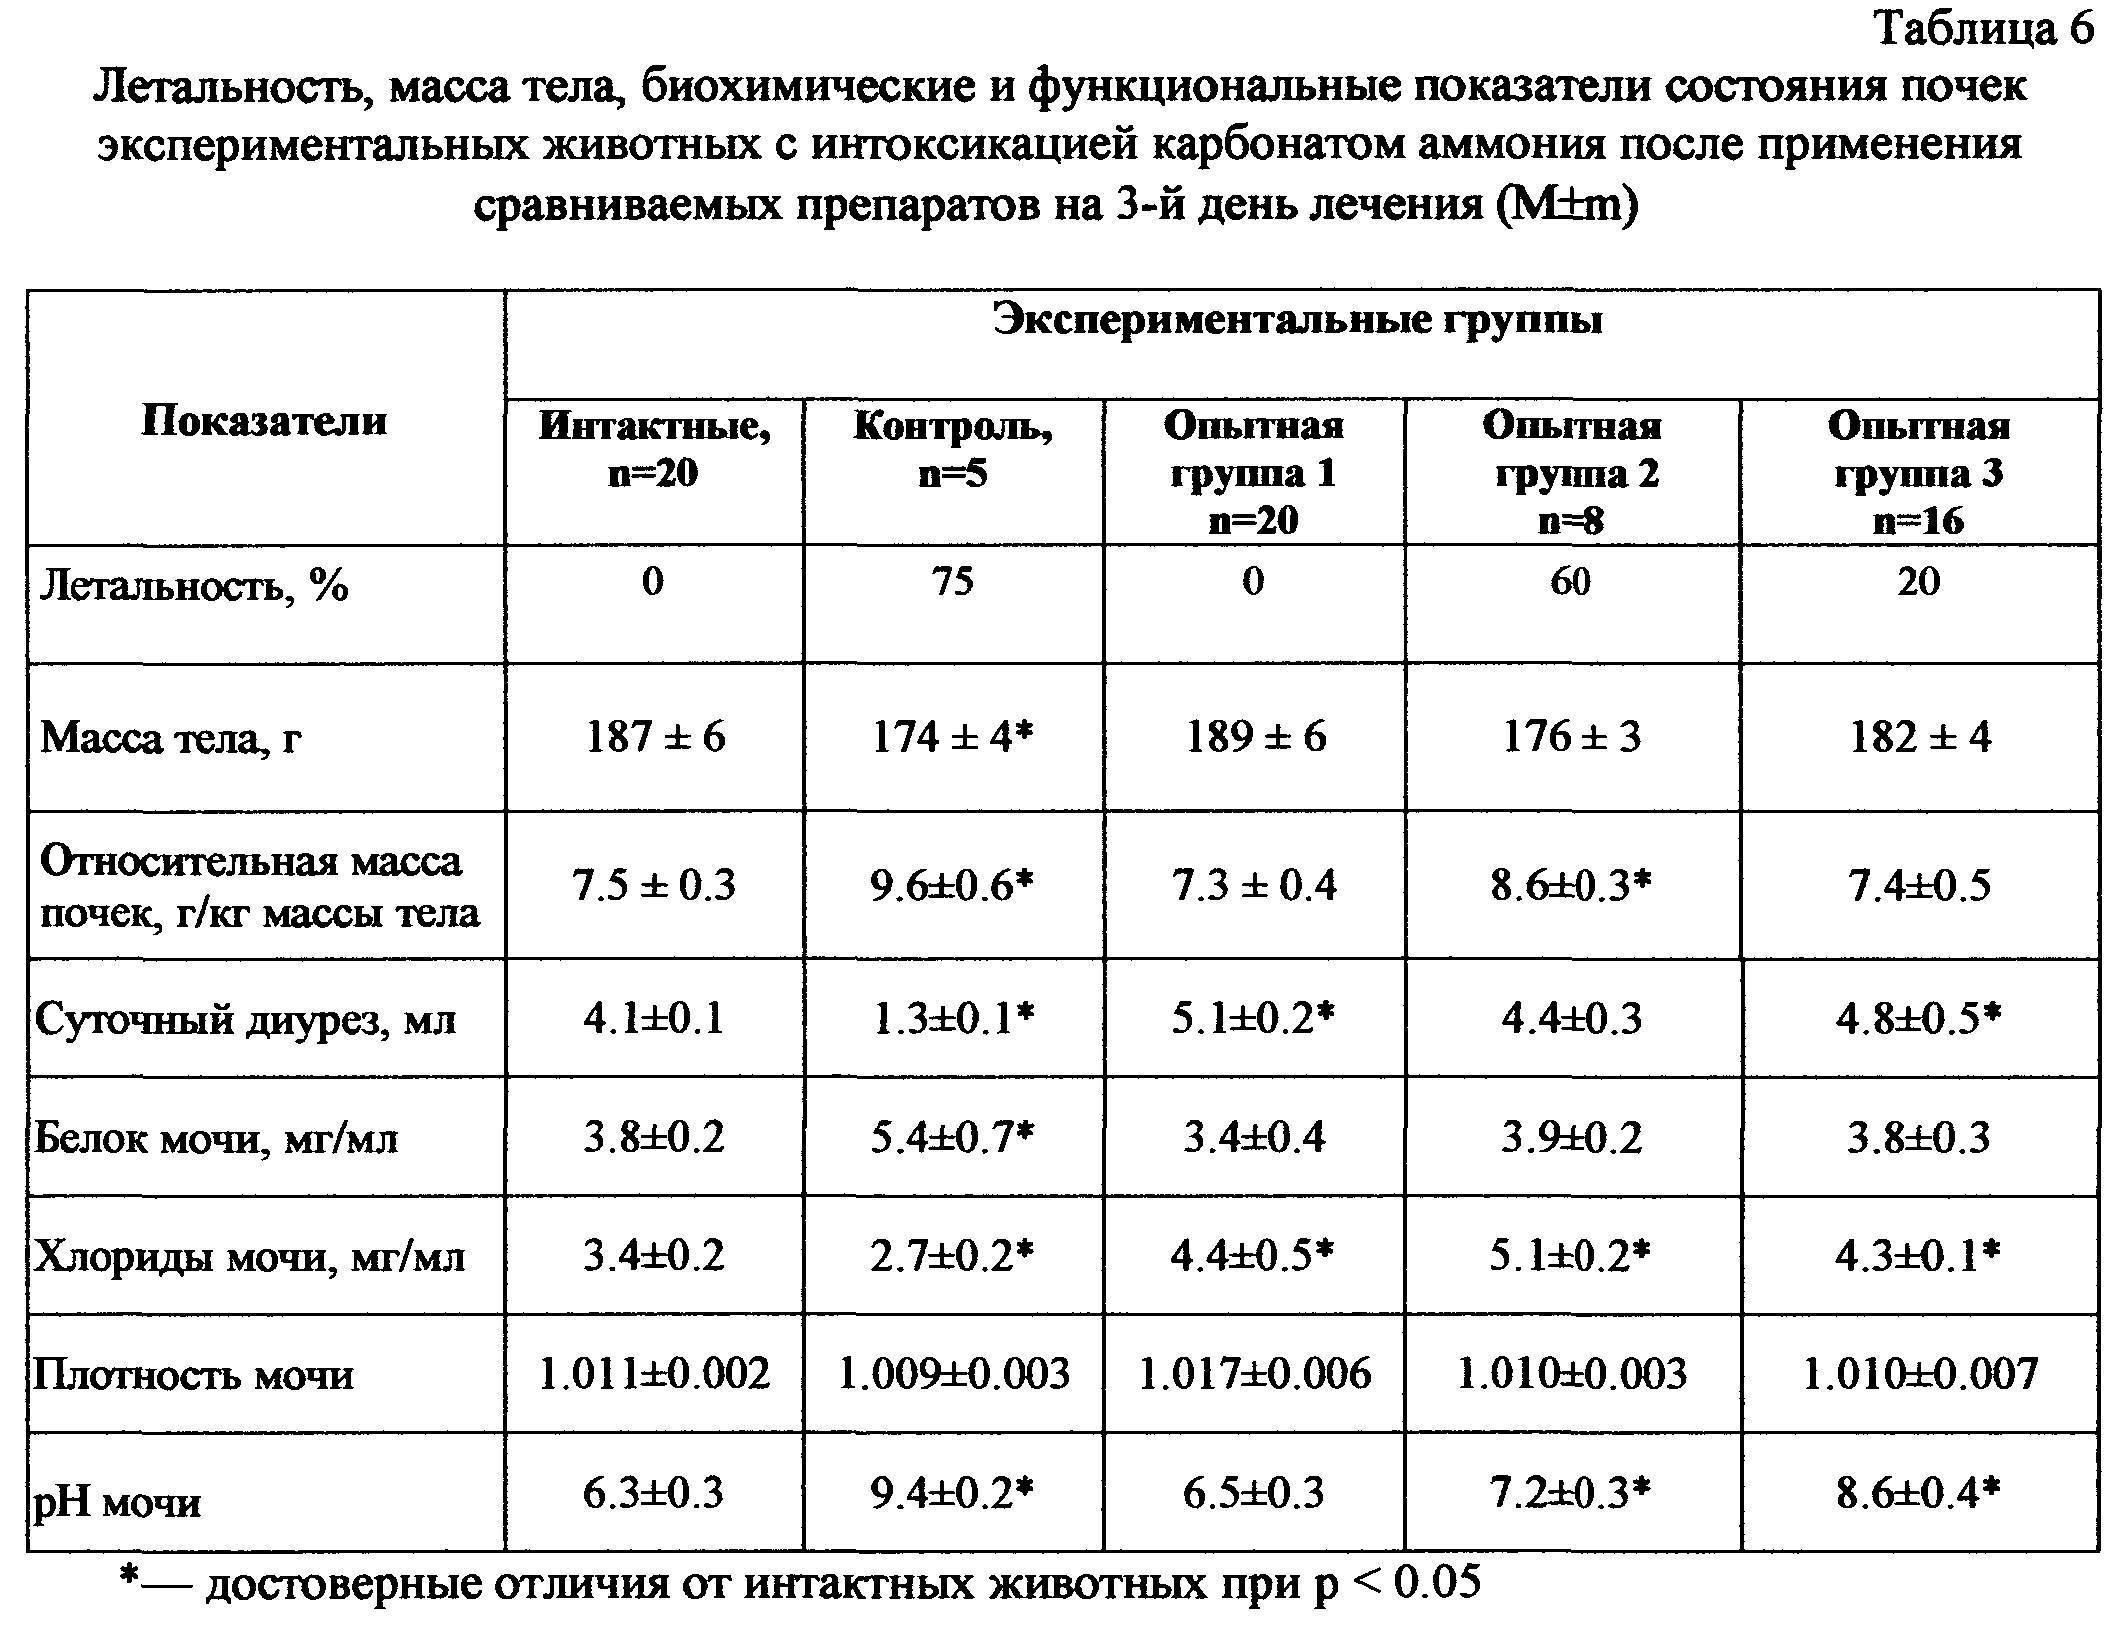 Норма суточного диуреза при беременности правила сбора и таблица и пример расчета